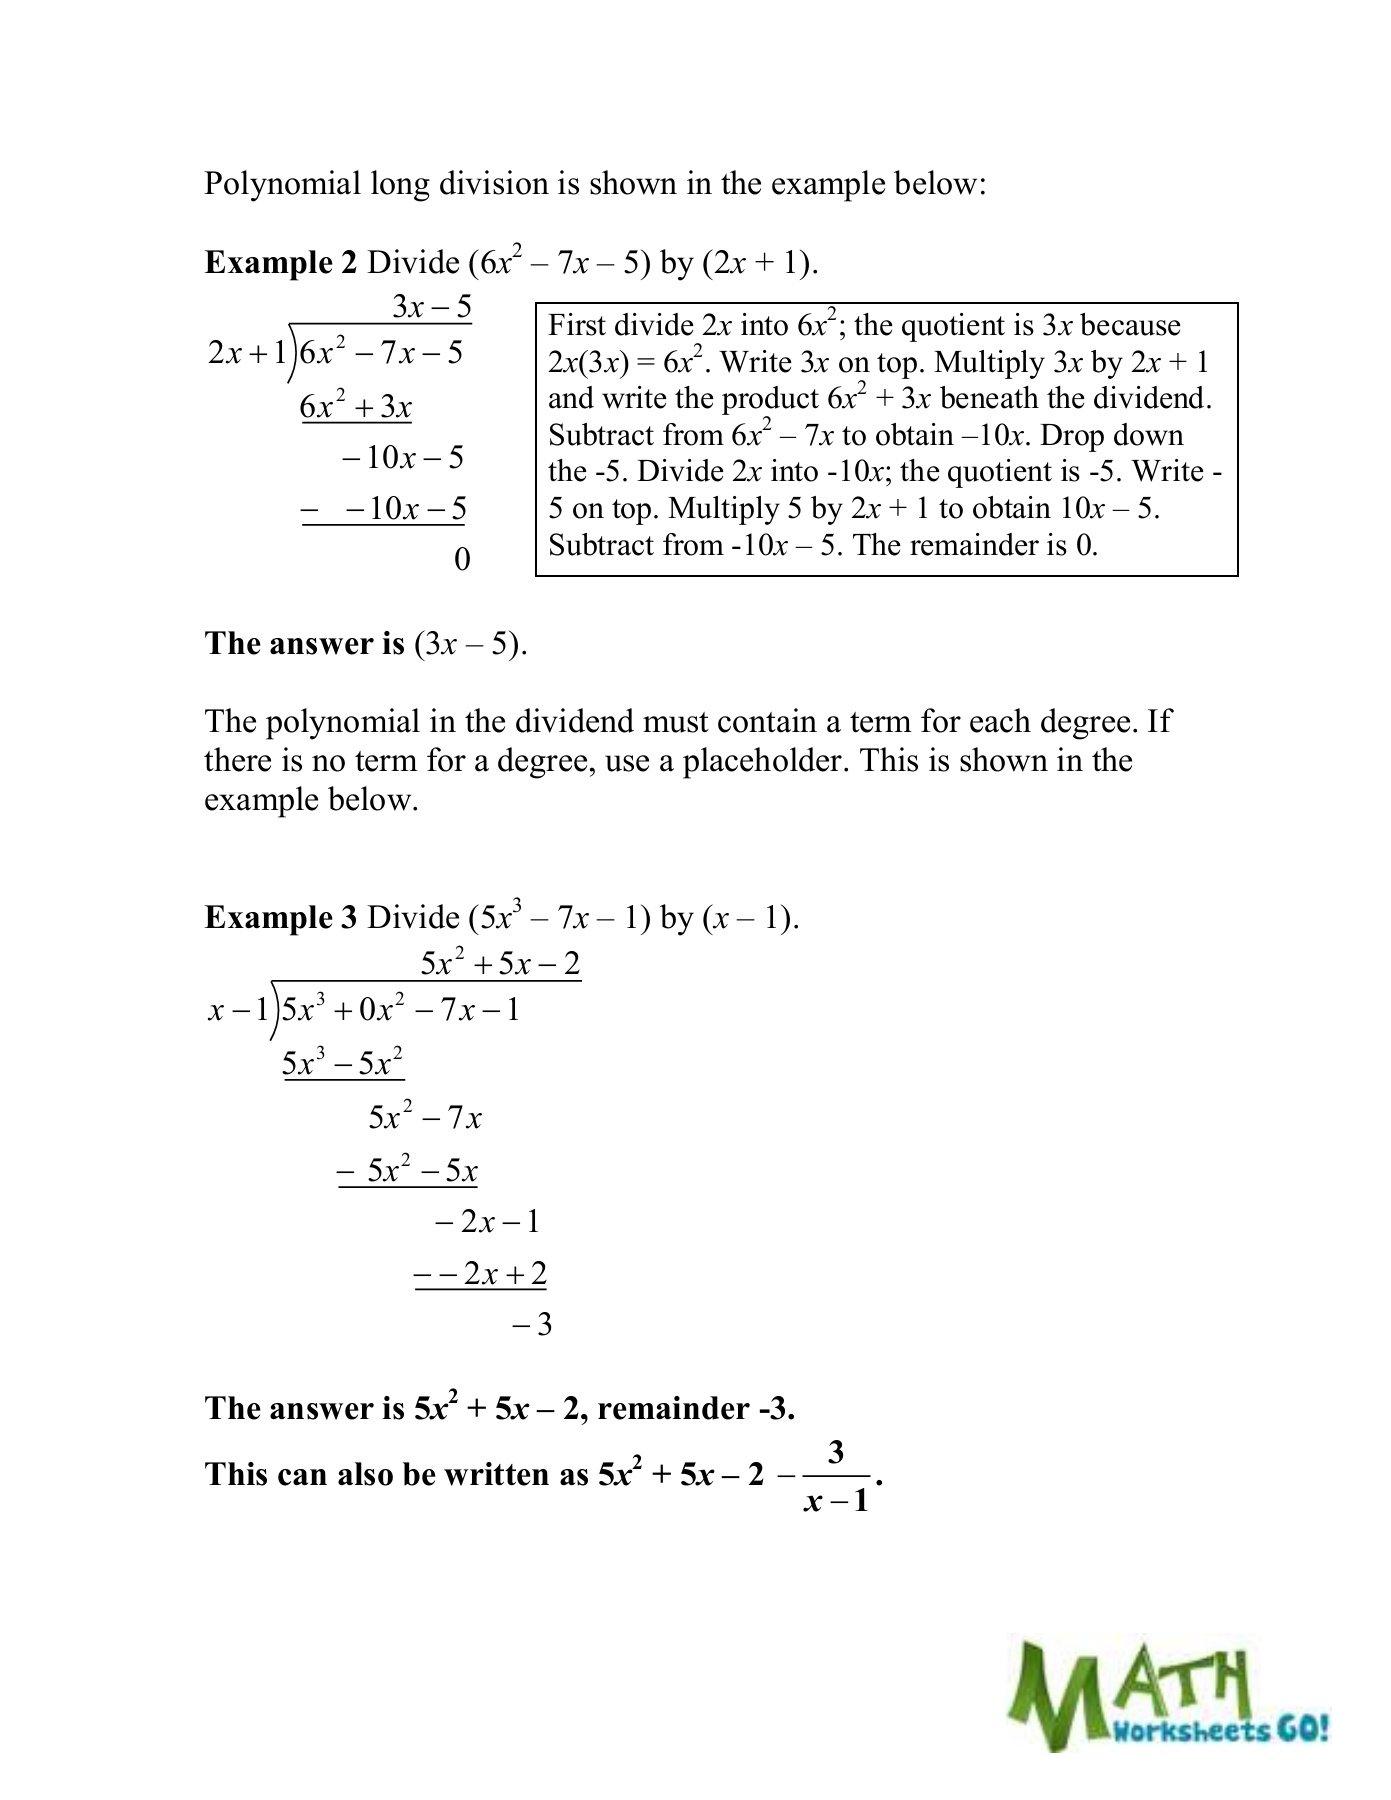 Dividing Polynomials Worksheet